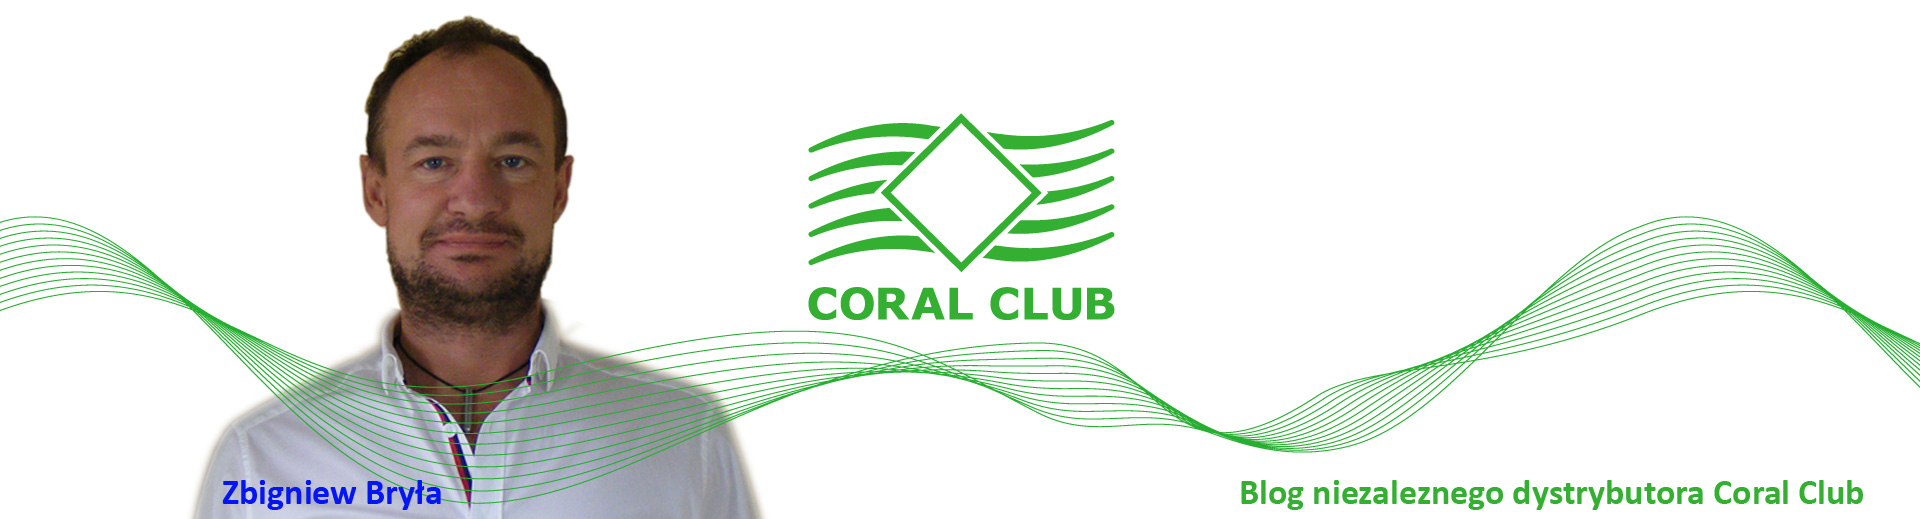 Coral Club - Blog niezależnego dystrybutora